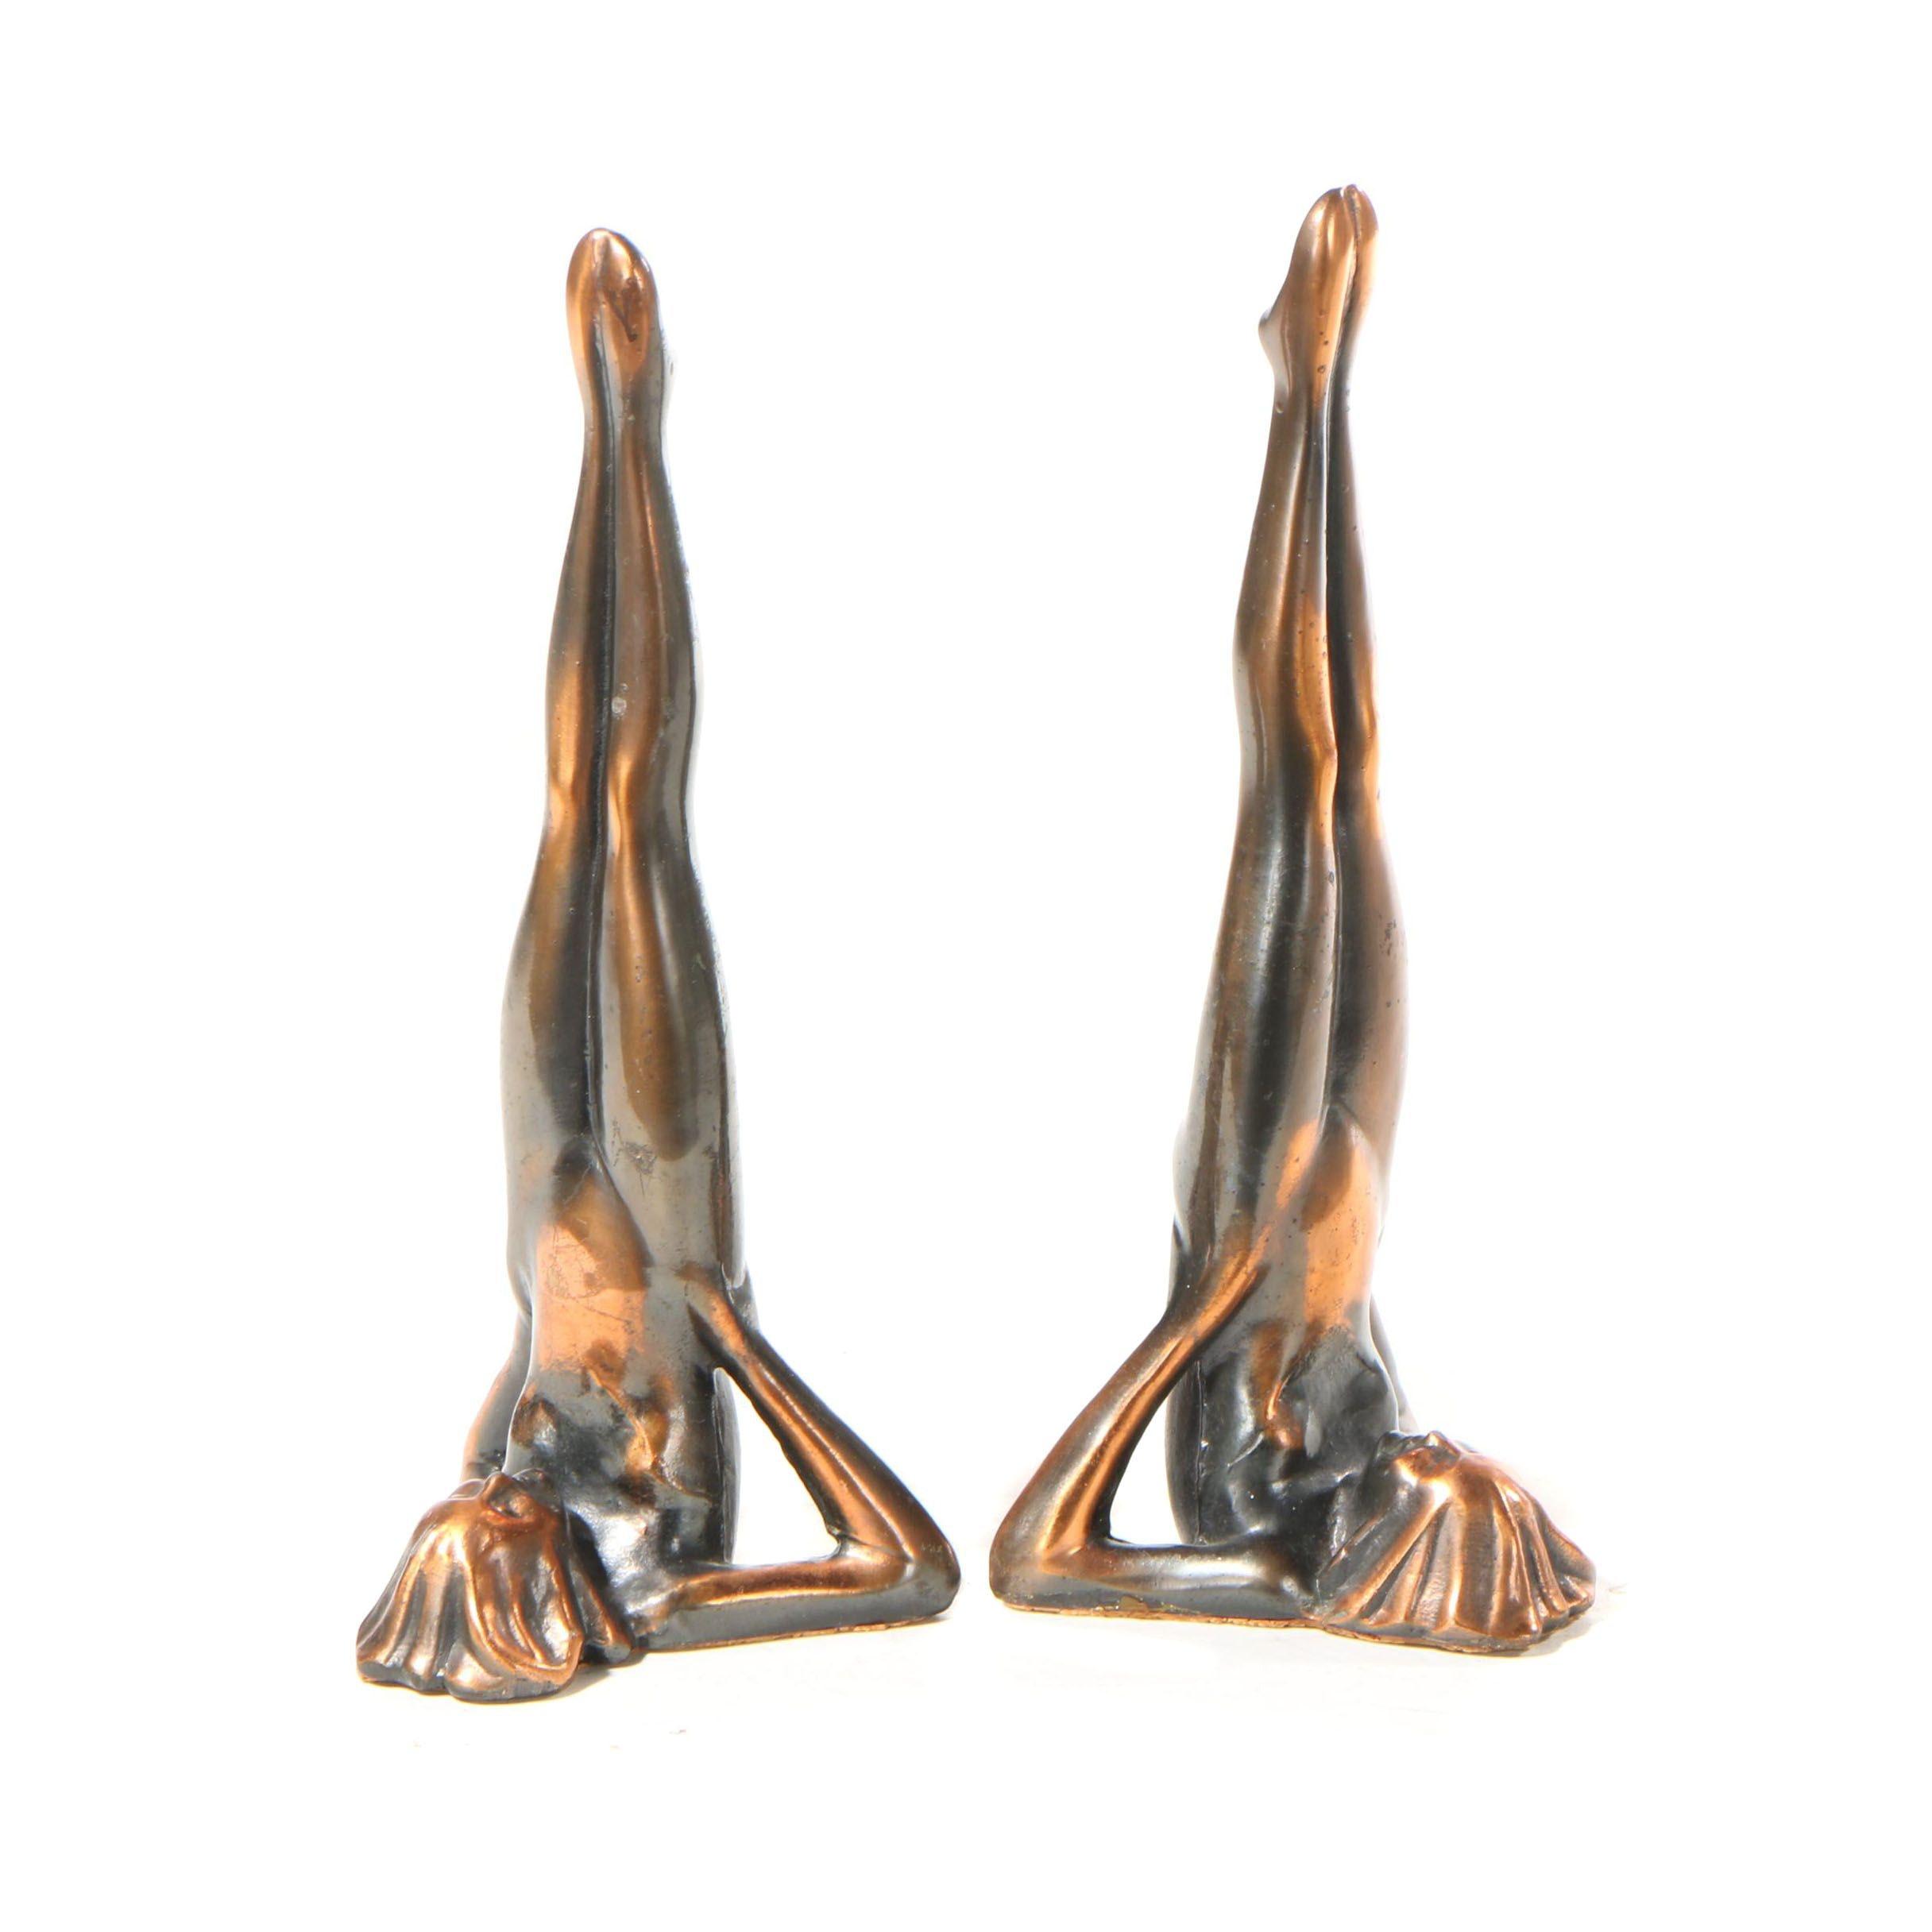 Cast Metal Art Deco Style Bookends